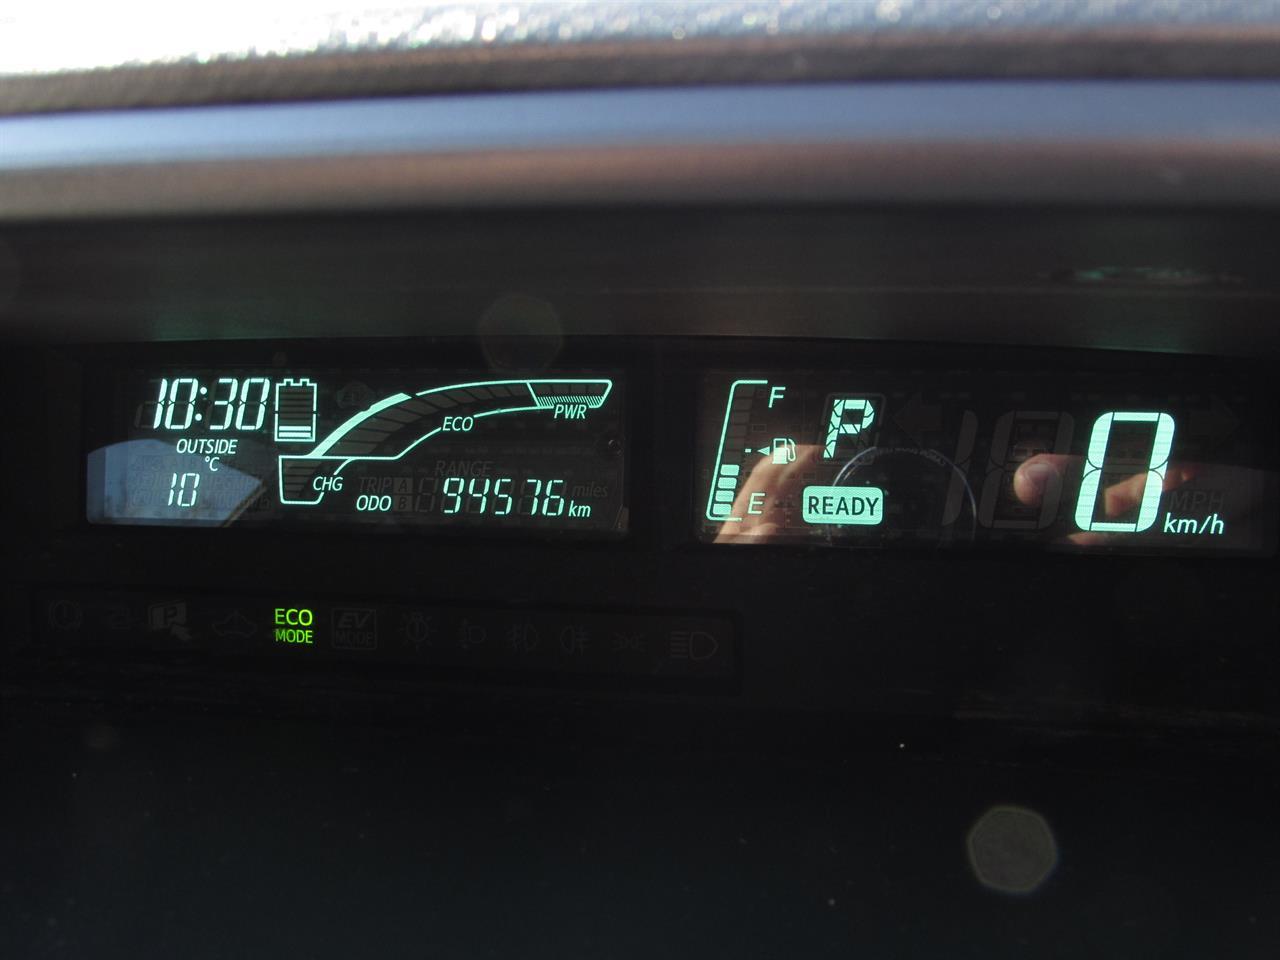 2013 Toyota Aqua | only $45 weekly